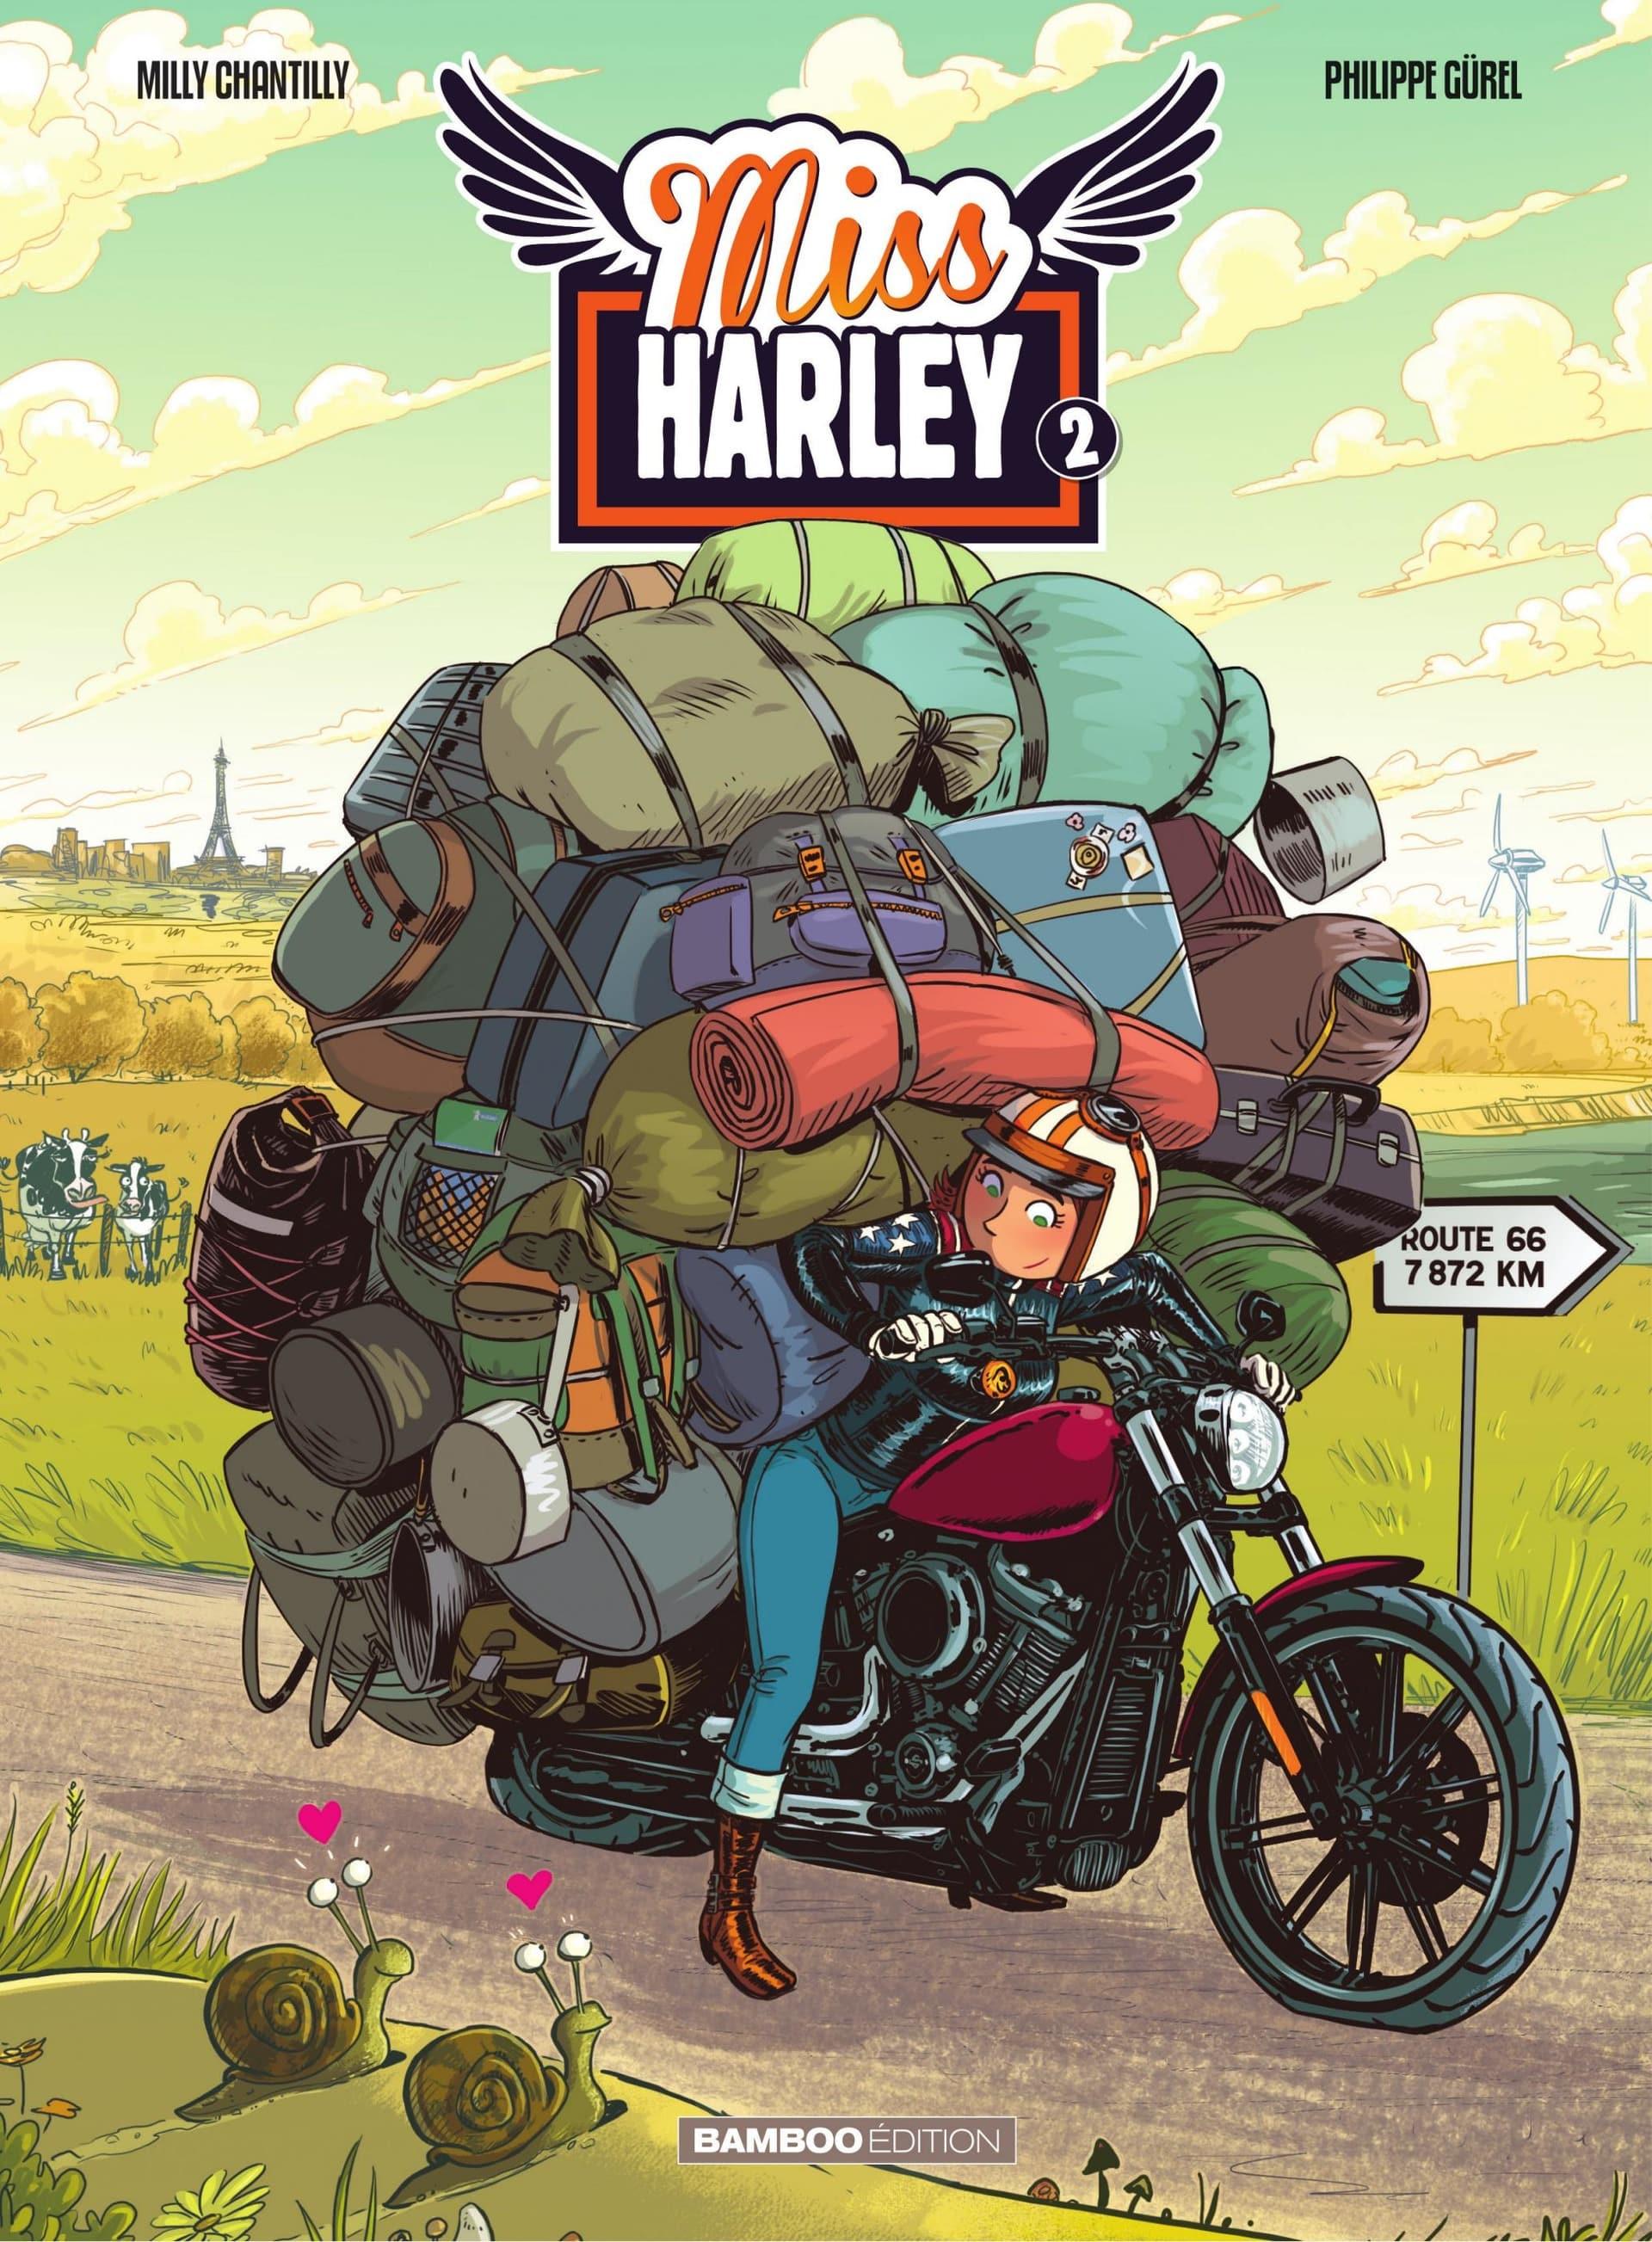 Miss Harley T2, elle persiste en beauté